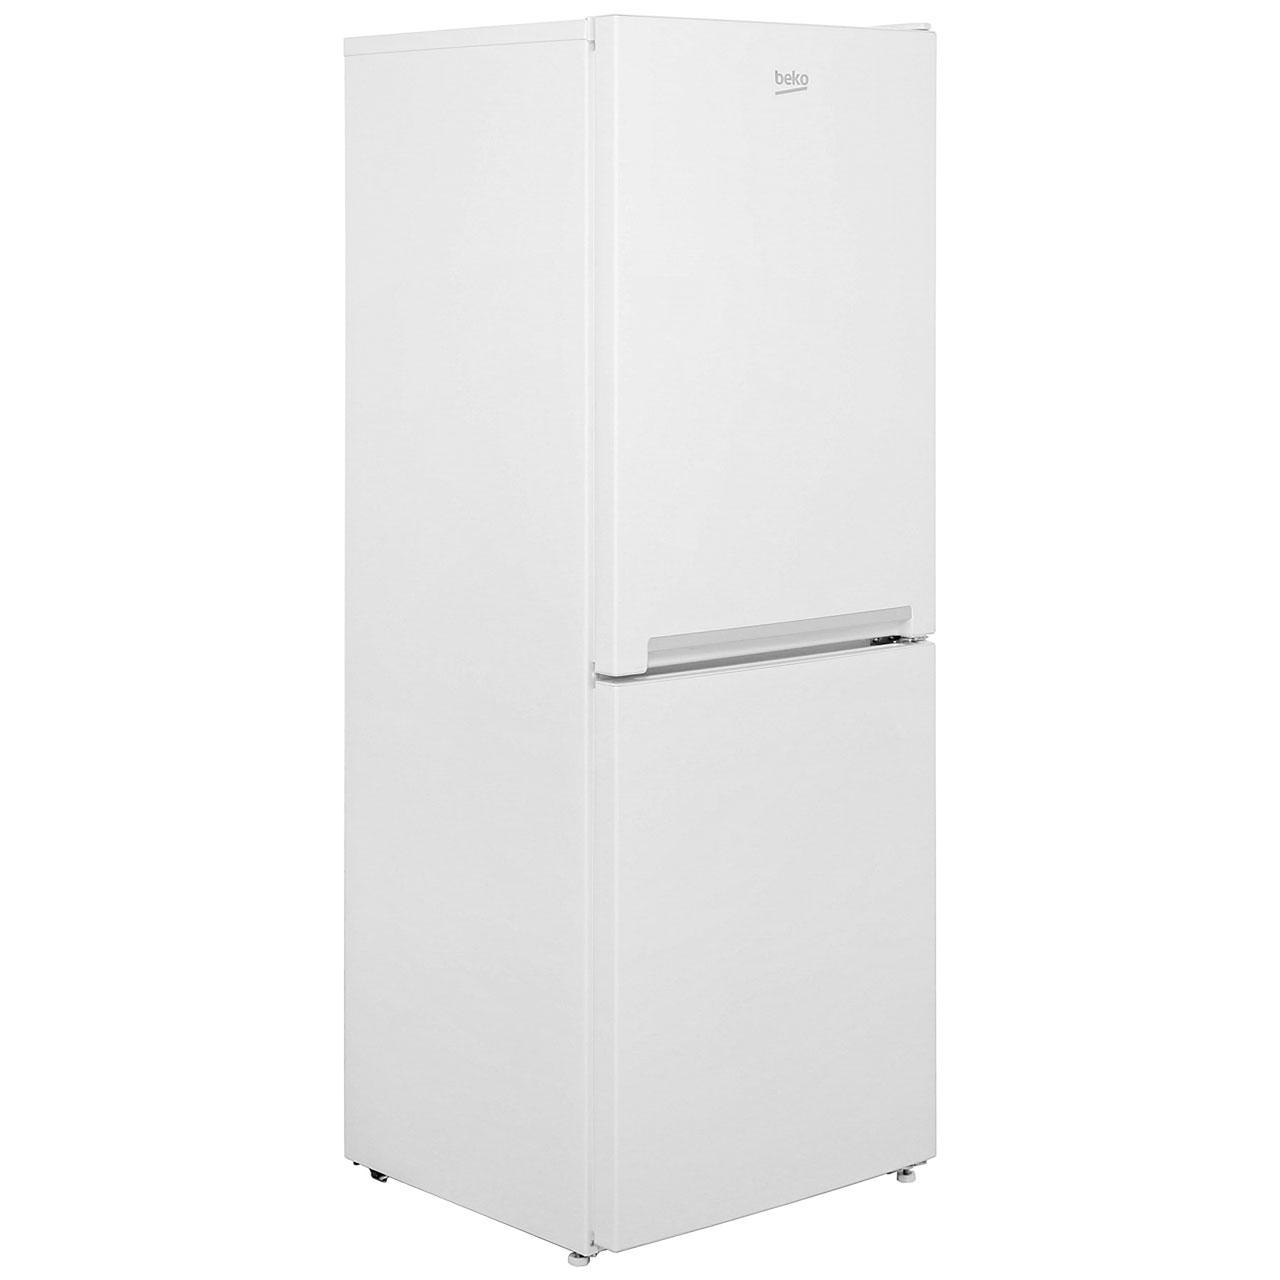 Beko Crfg1552w Fridge Freezer White